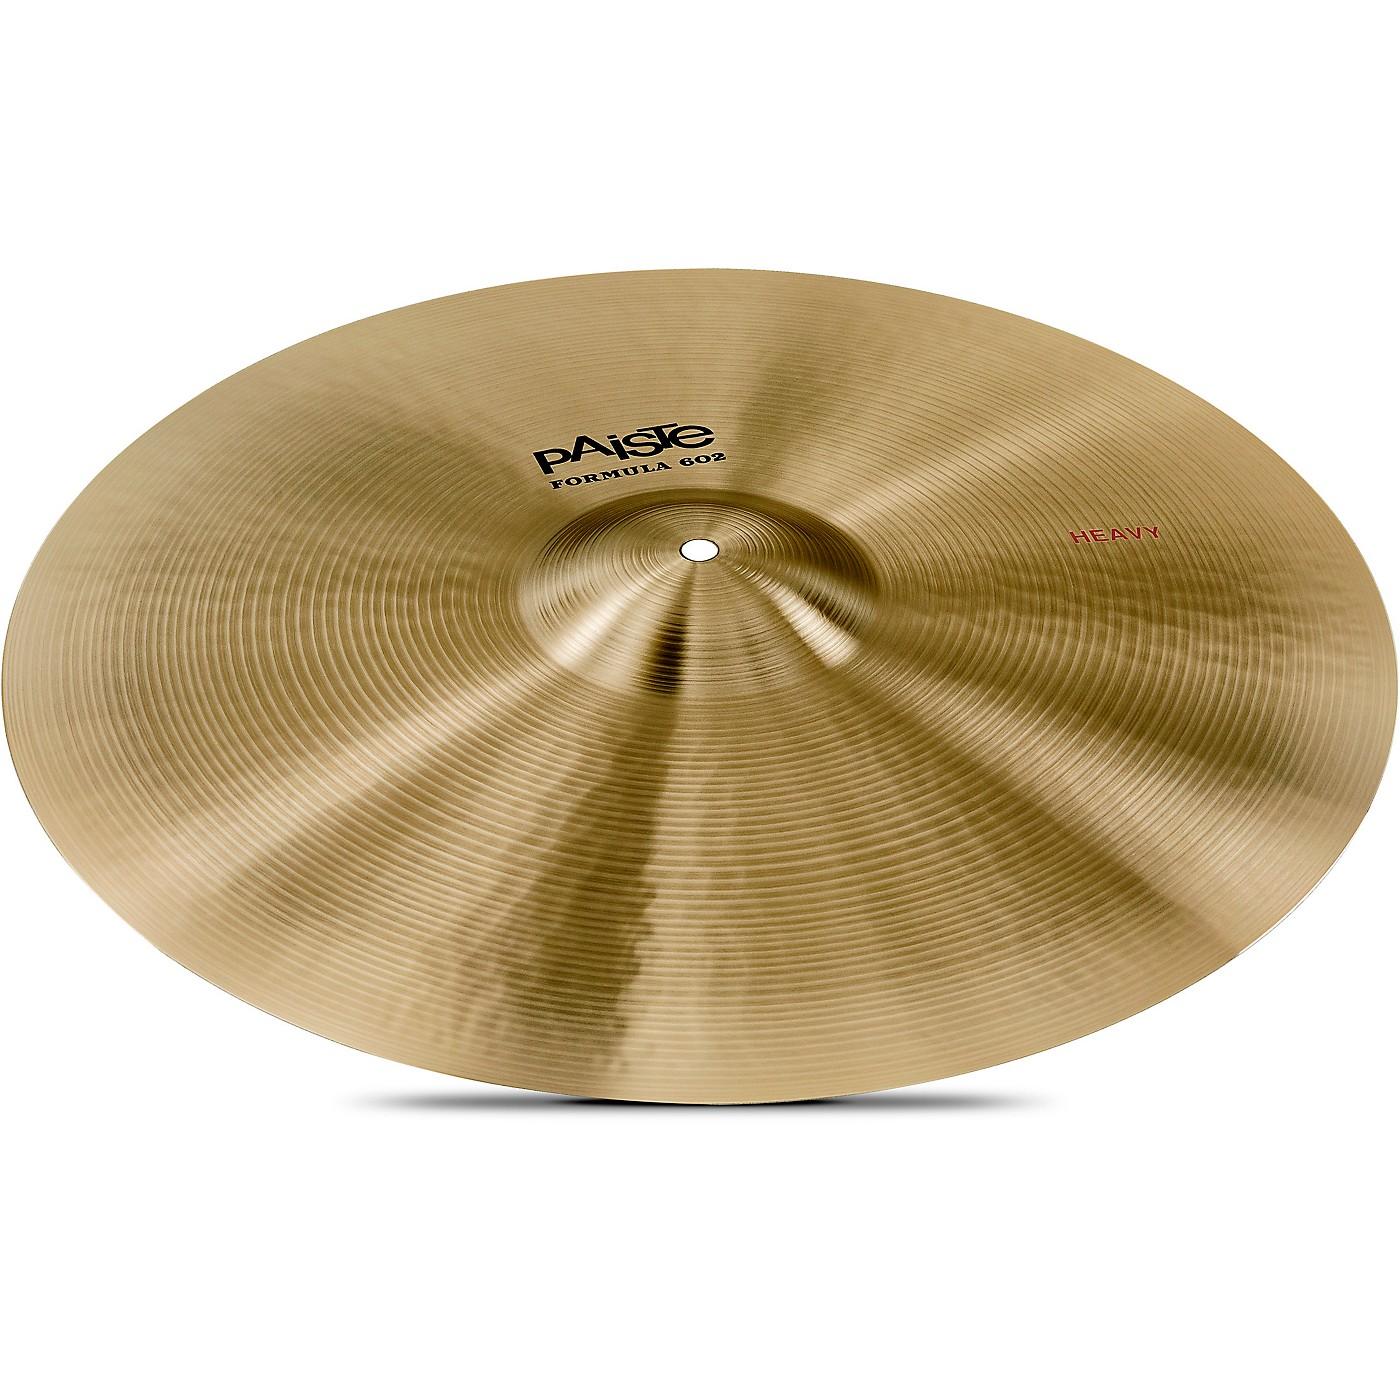 Paiste Formula 602 Heavy Crash Cymbal thumbnail